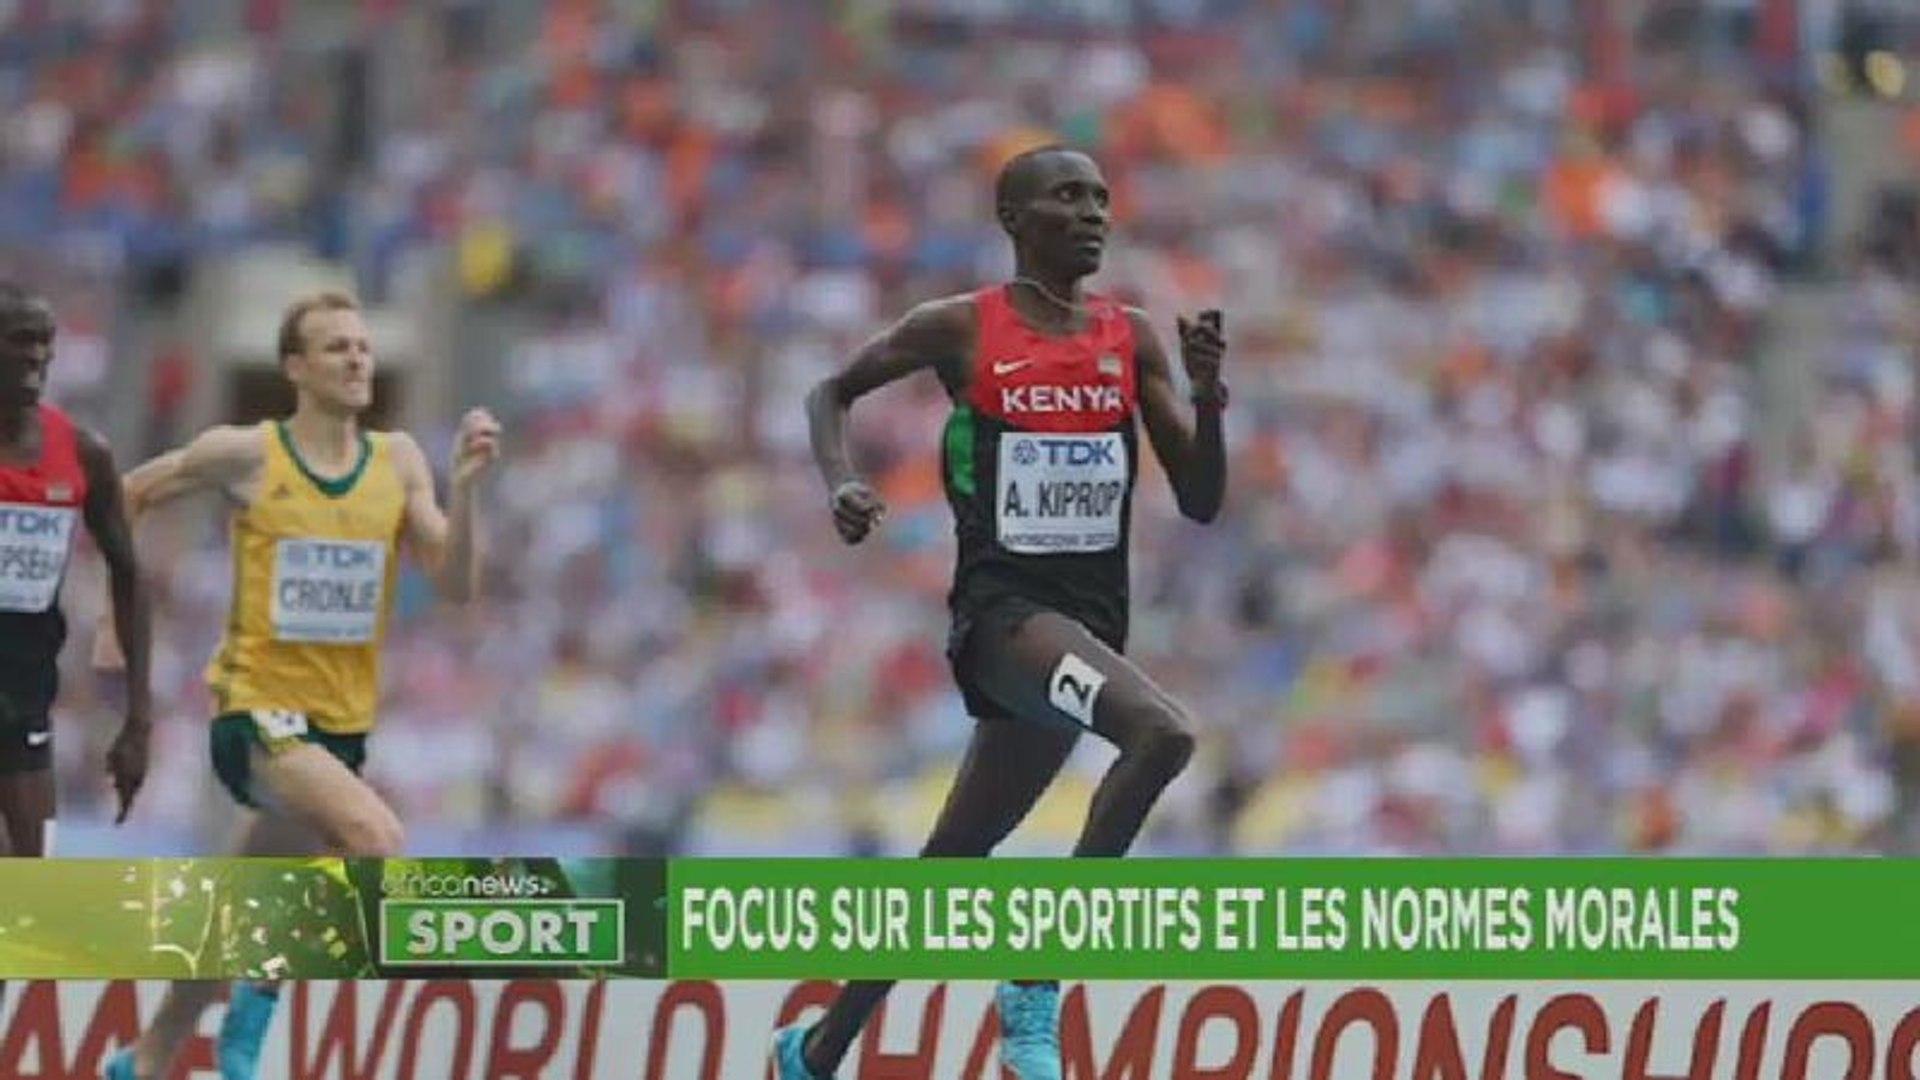 Spotlight on moral standards in sport [Sport]